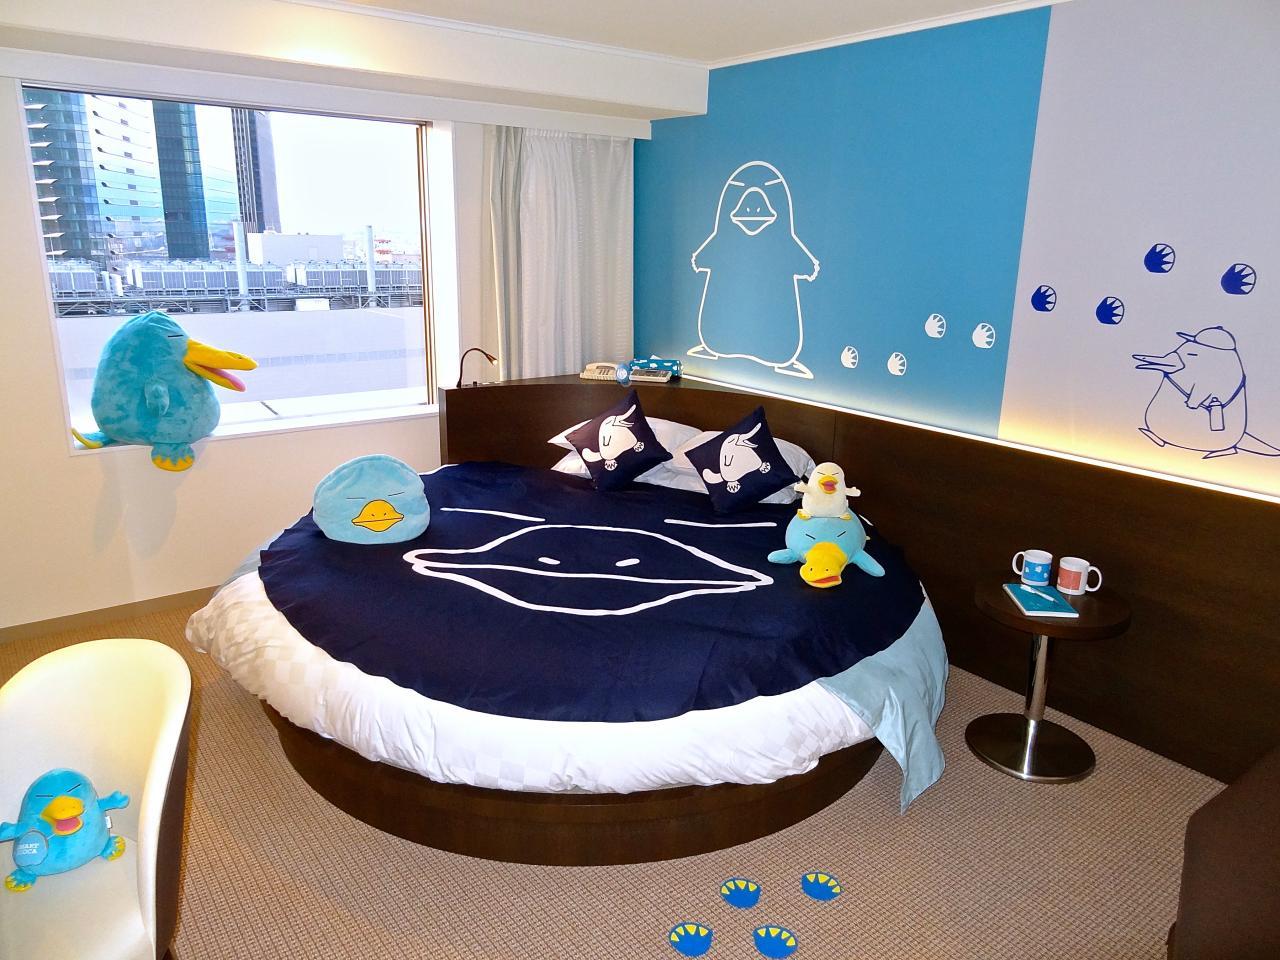 Room photo 11 from hotel Viale Osaka